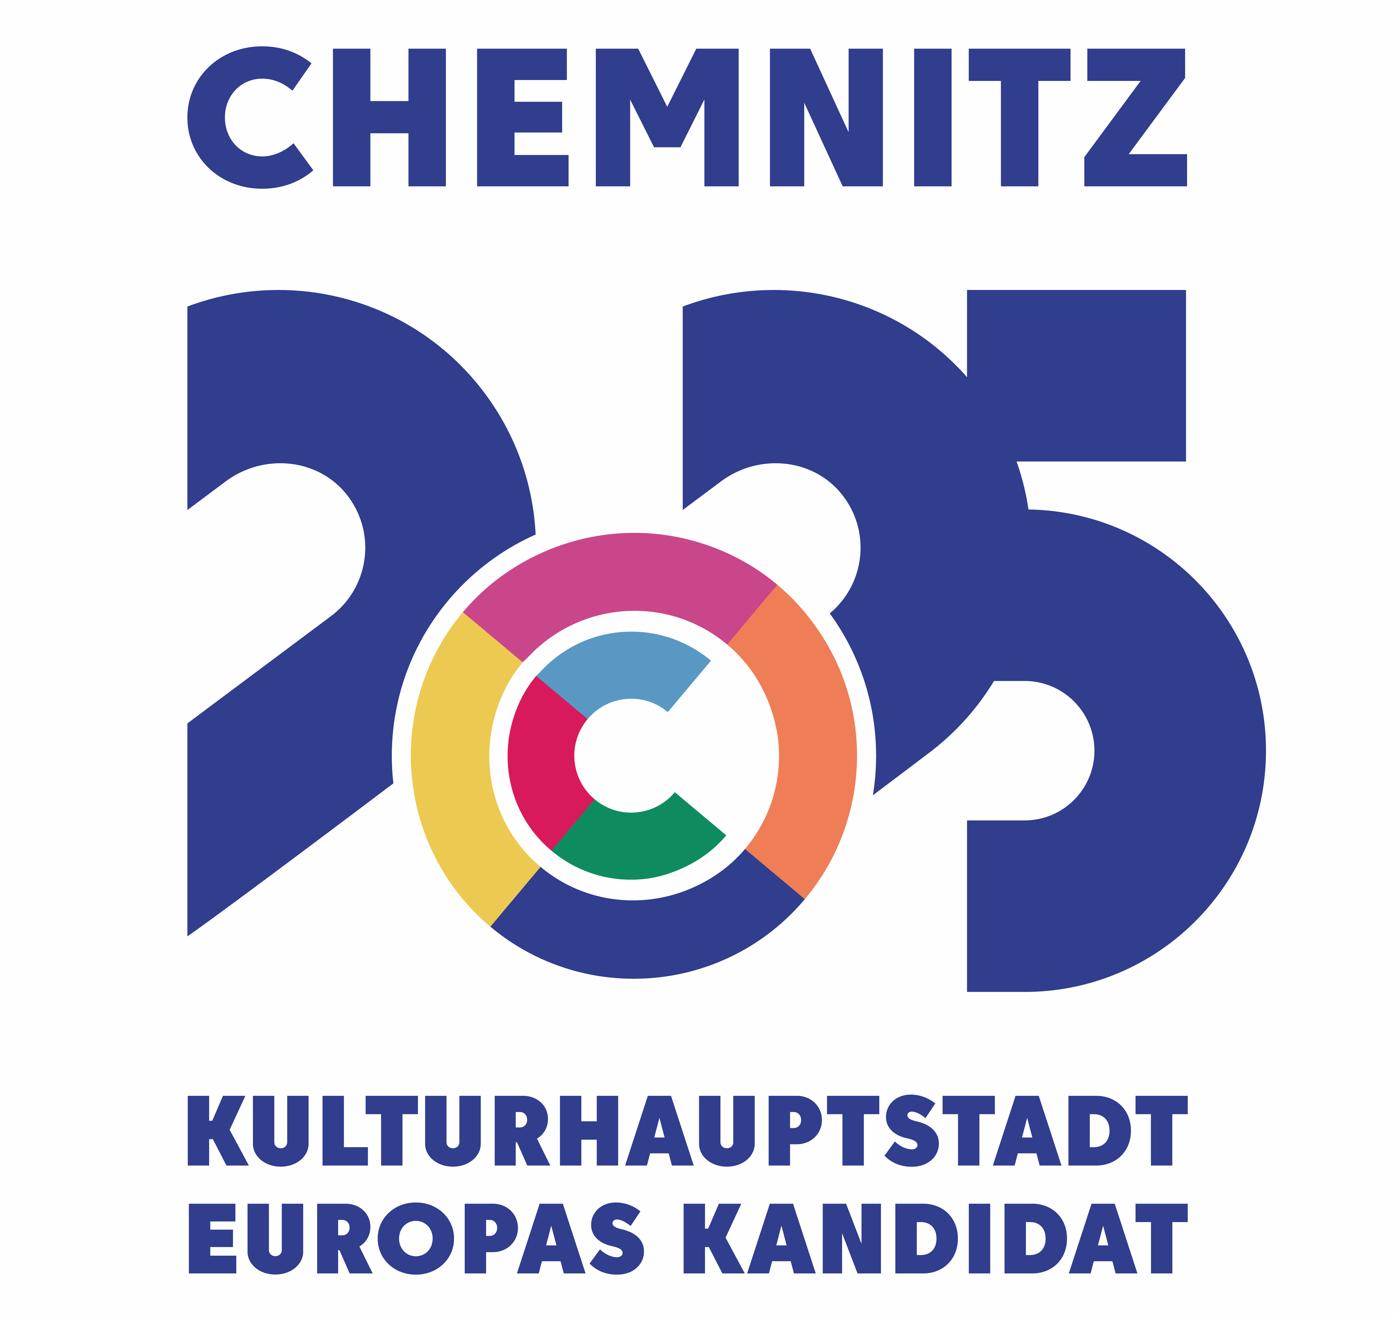 Chemnitz Kulturhauptstadt Europas